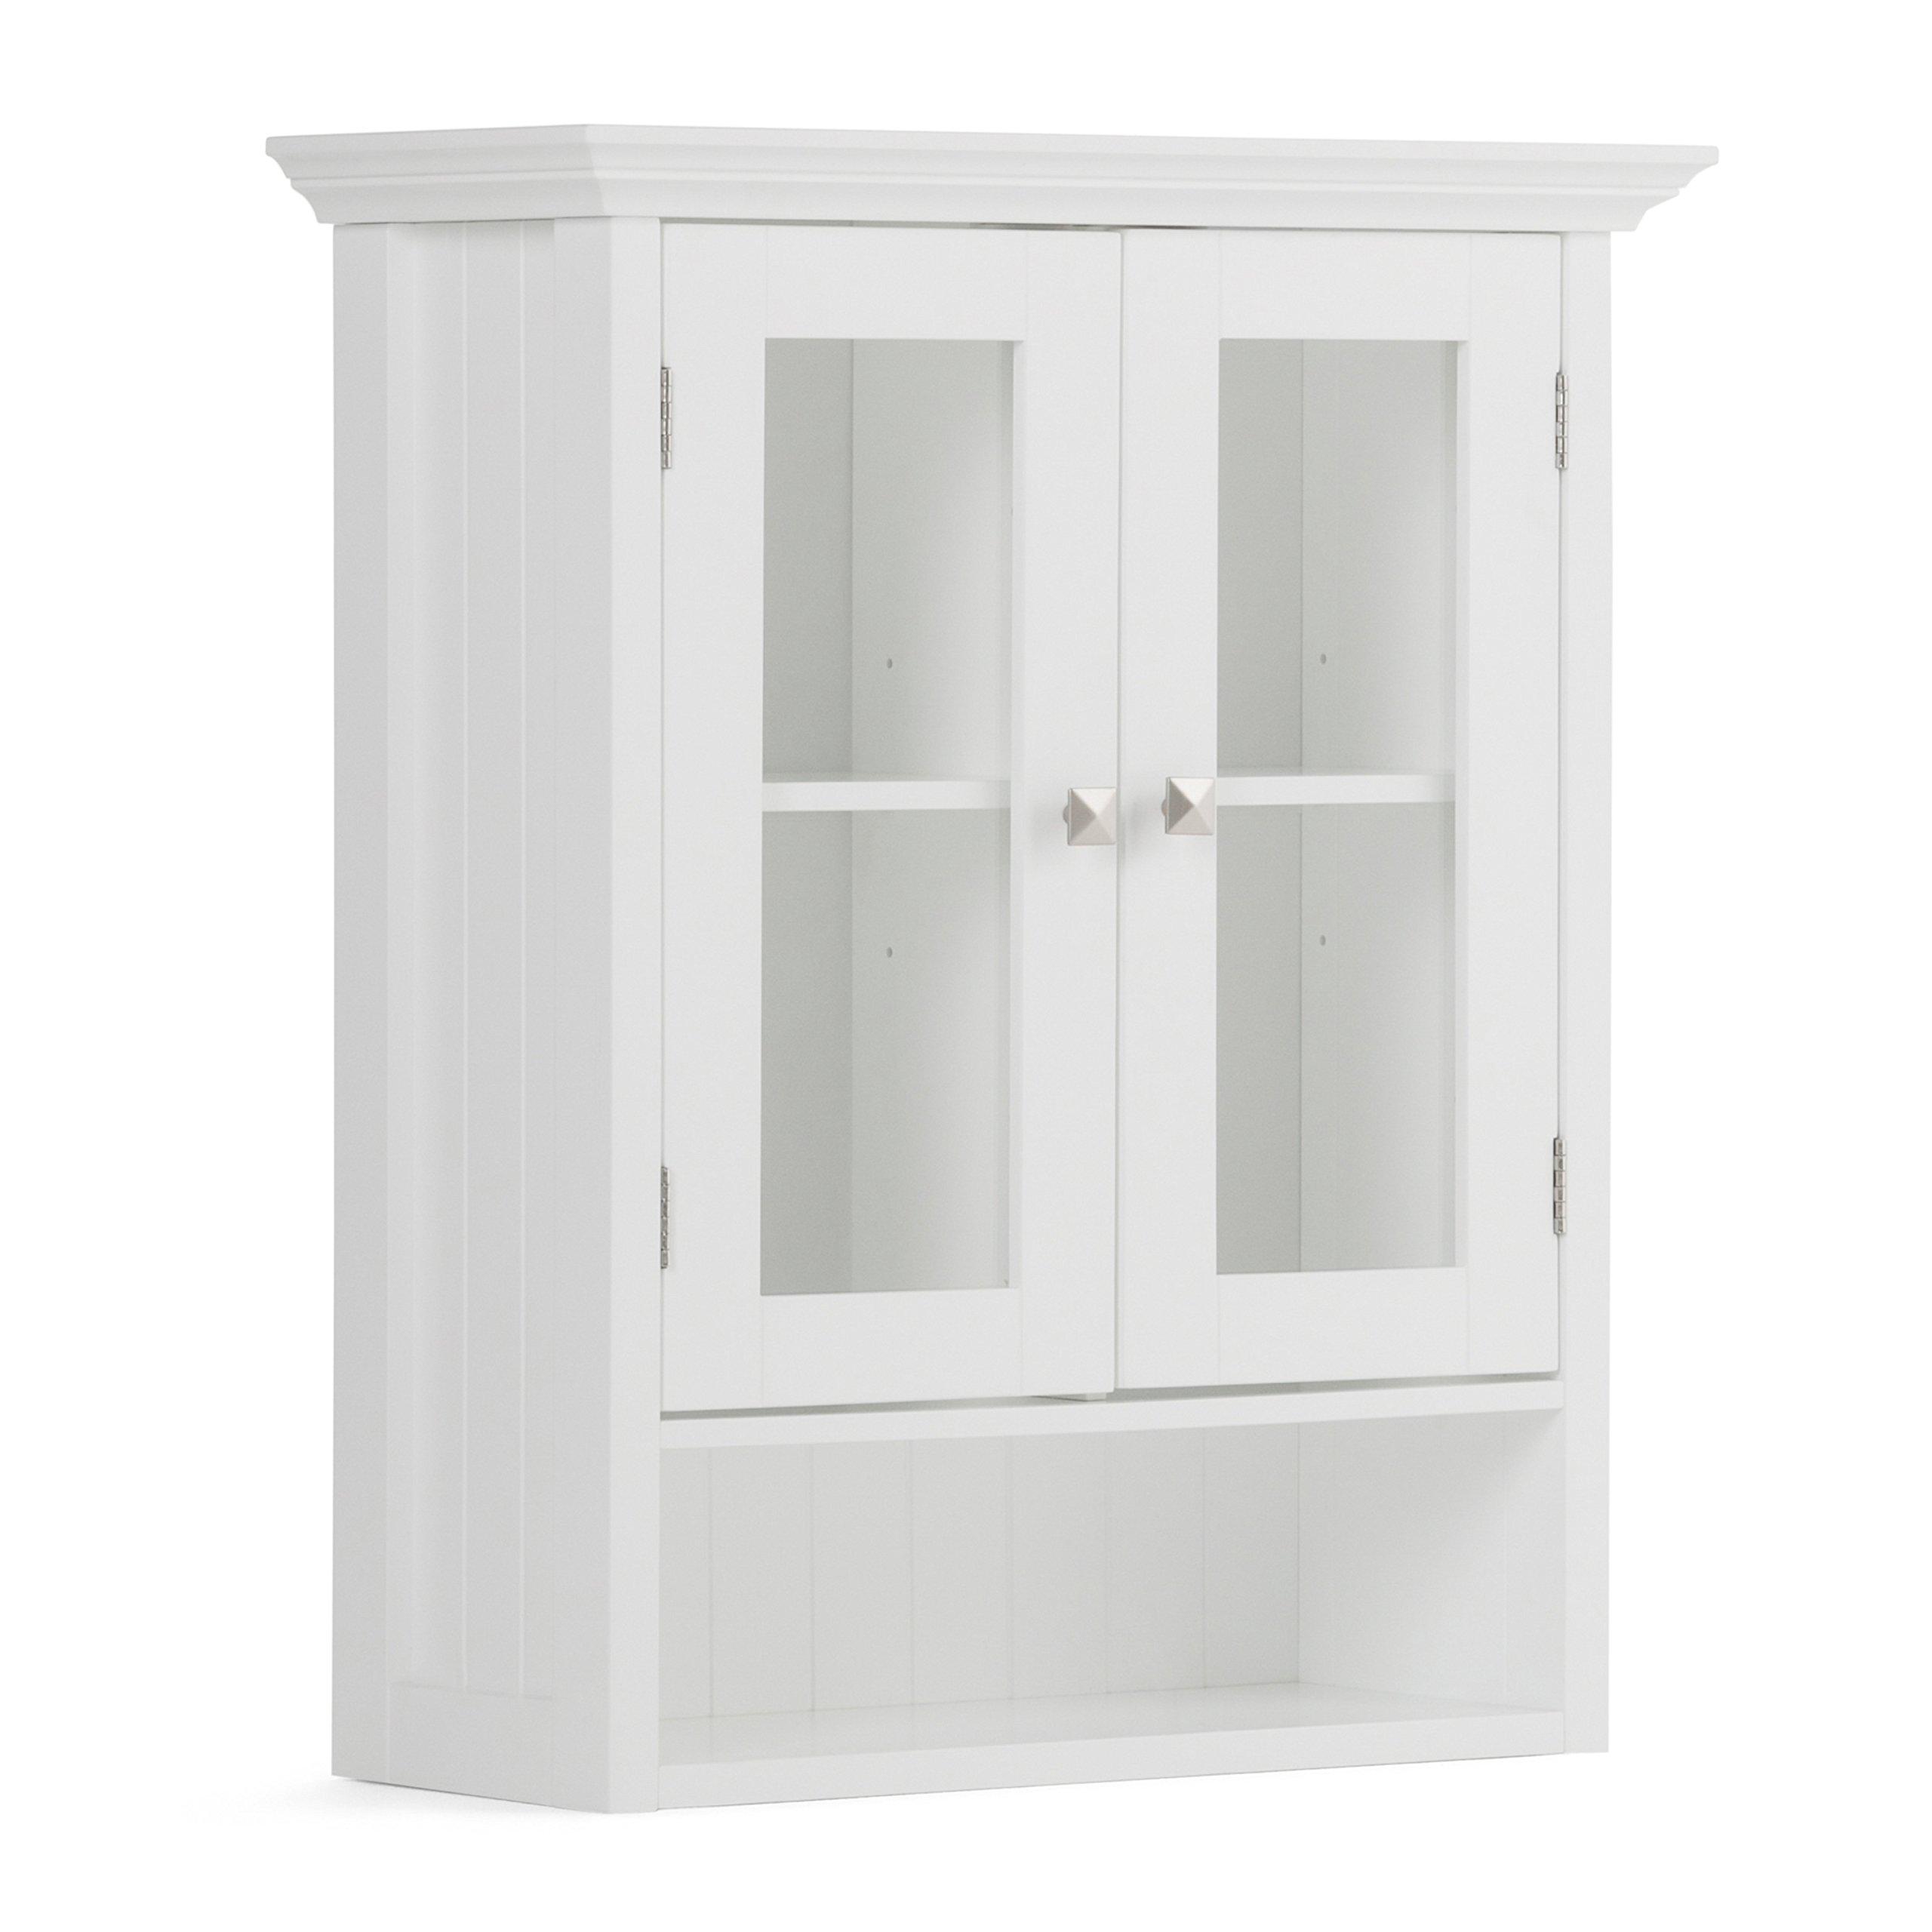 Simpli Home Acadian Double Door Wall Cabinet, White